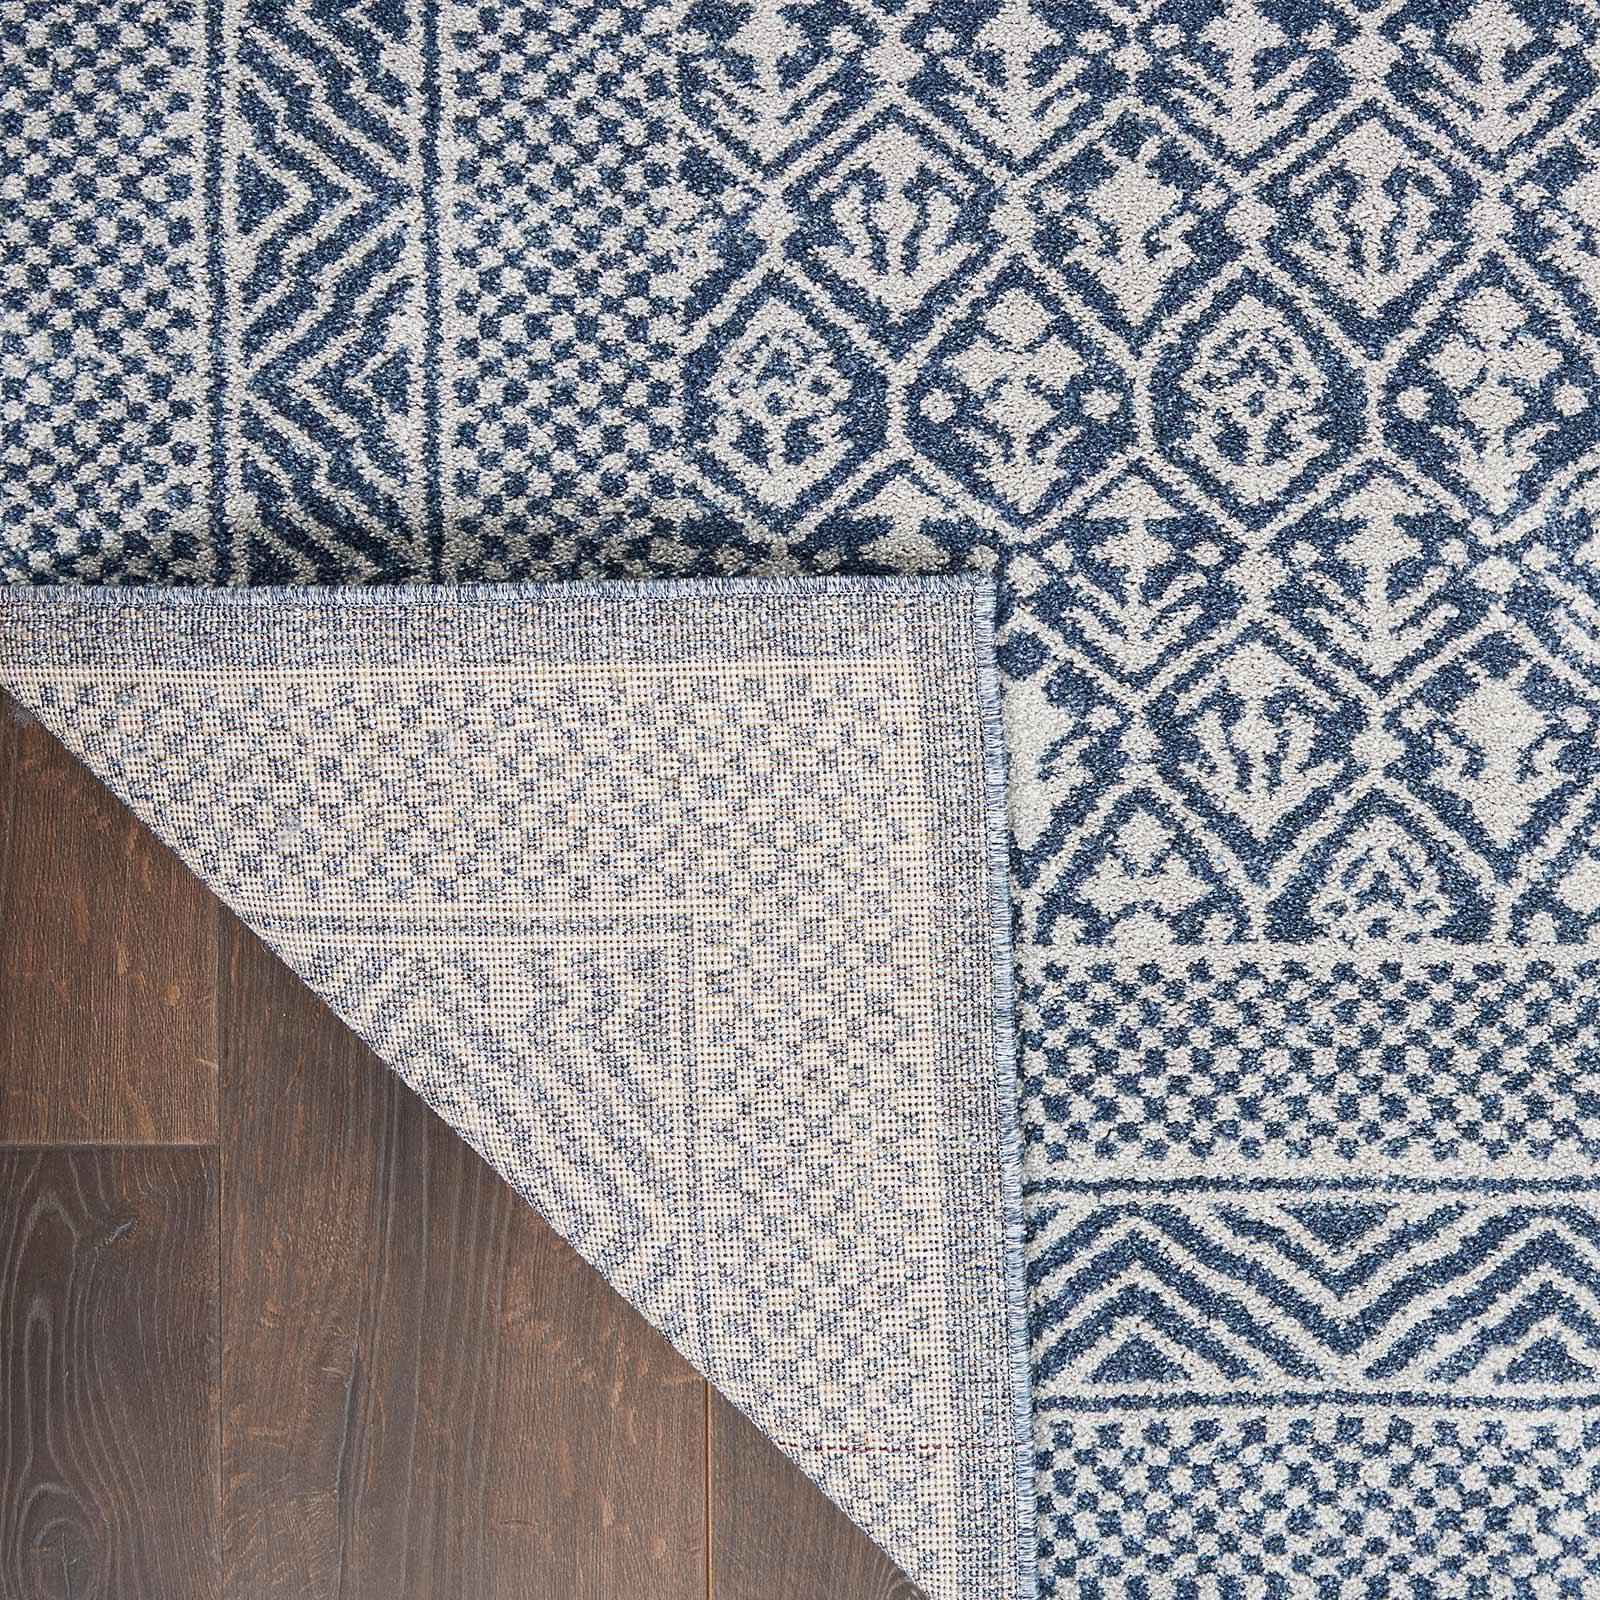 Nourison rug Palermo PMR01 BLUE GREY 5x7 099446719669 CRB C